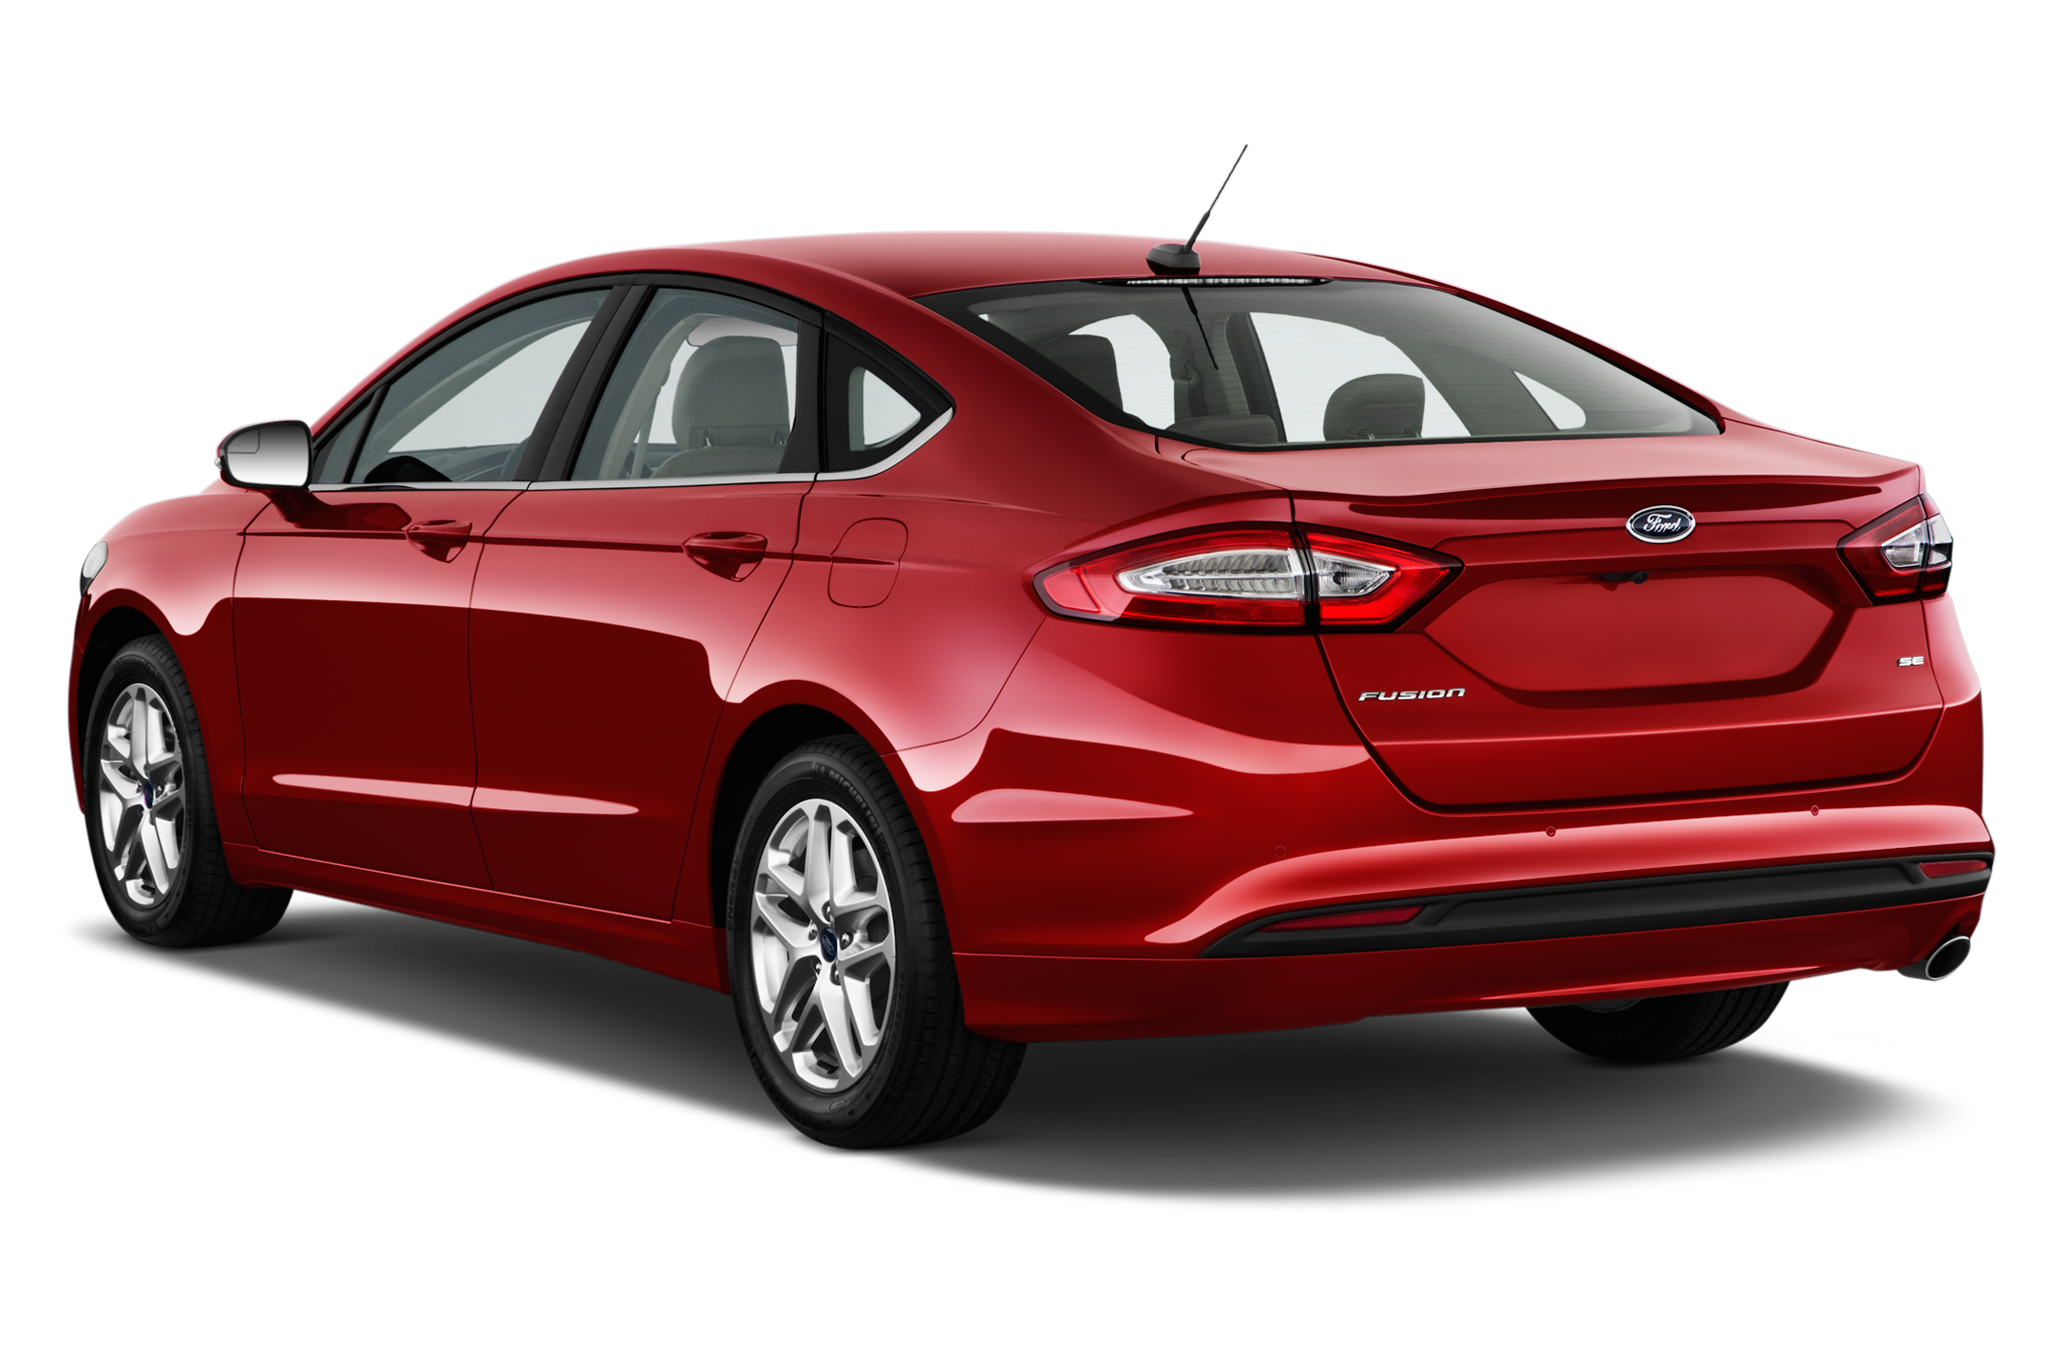 Ford Fusion Titanium Hybrid 2014 International Price